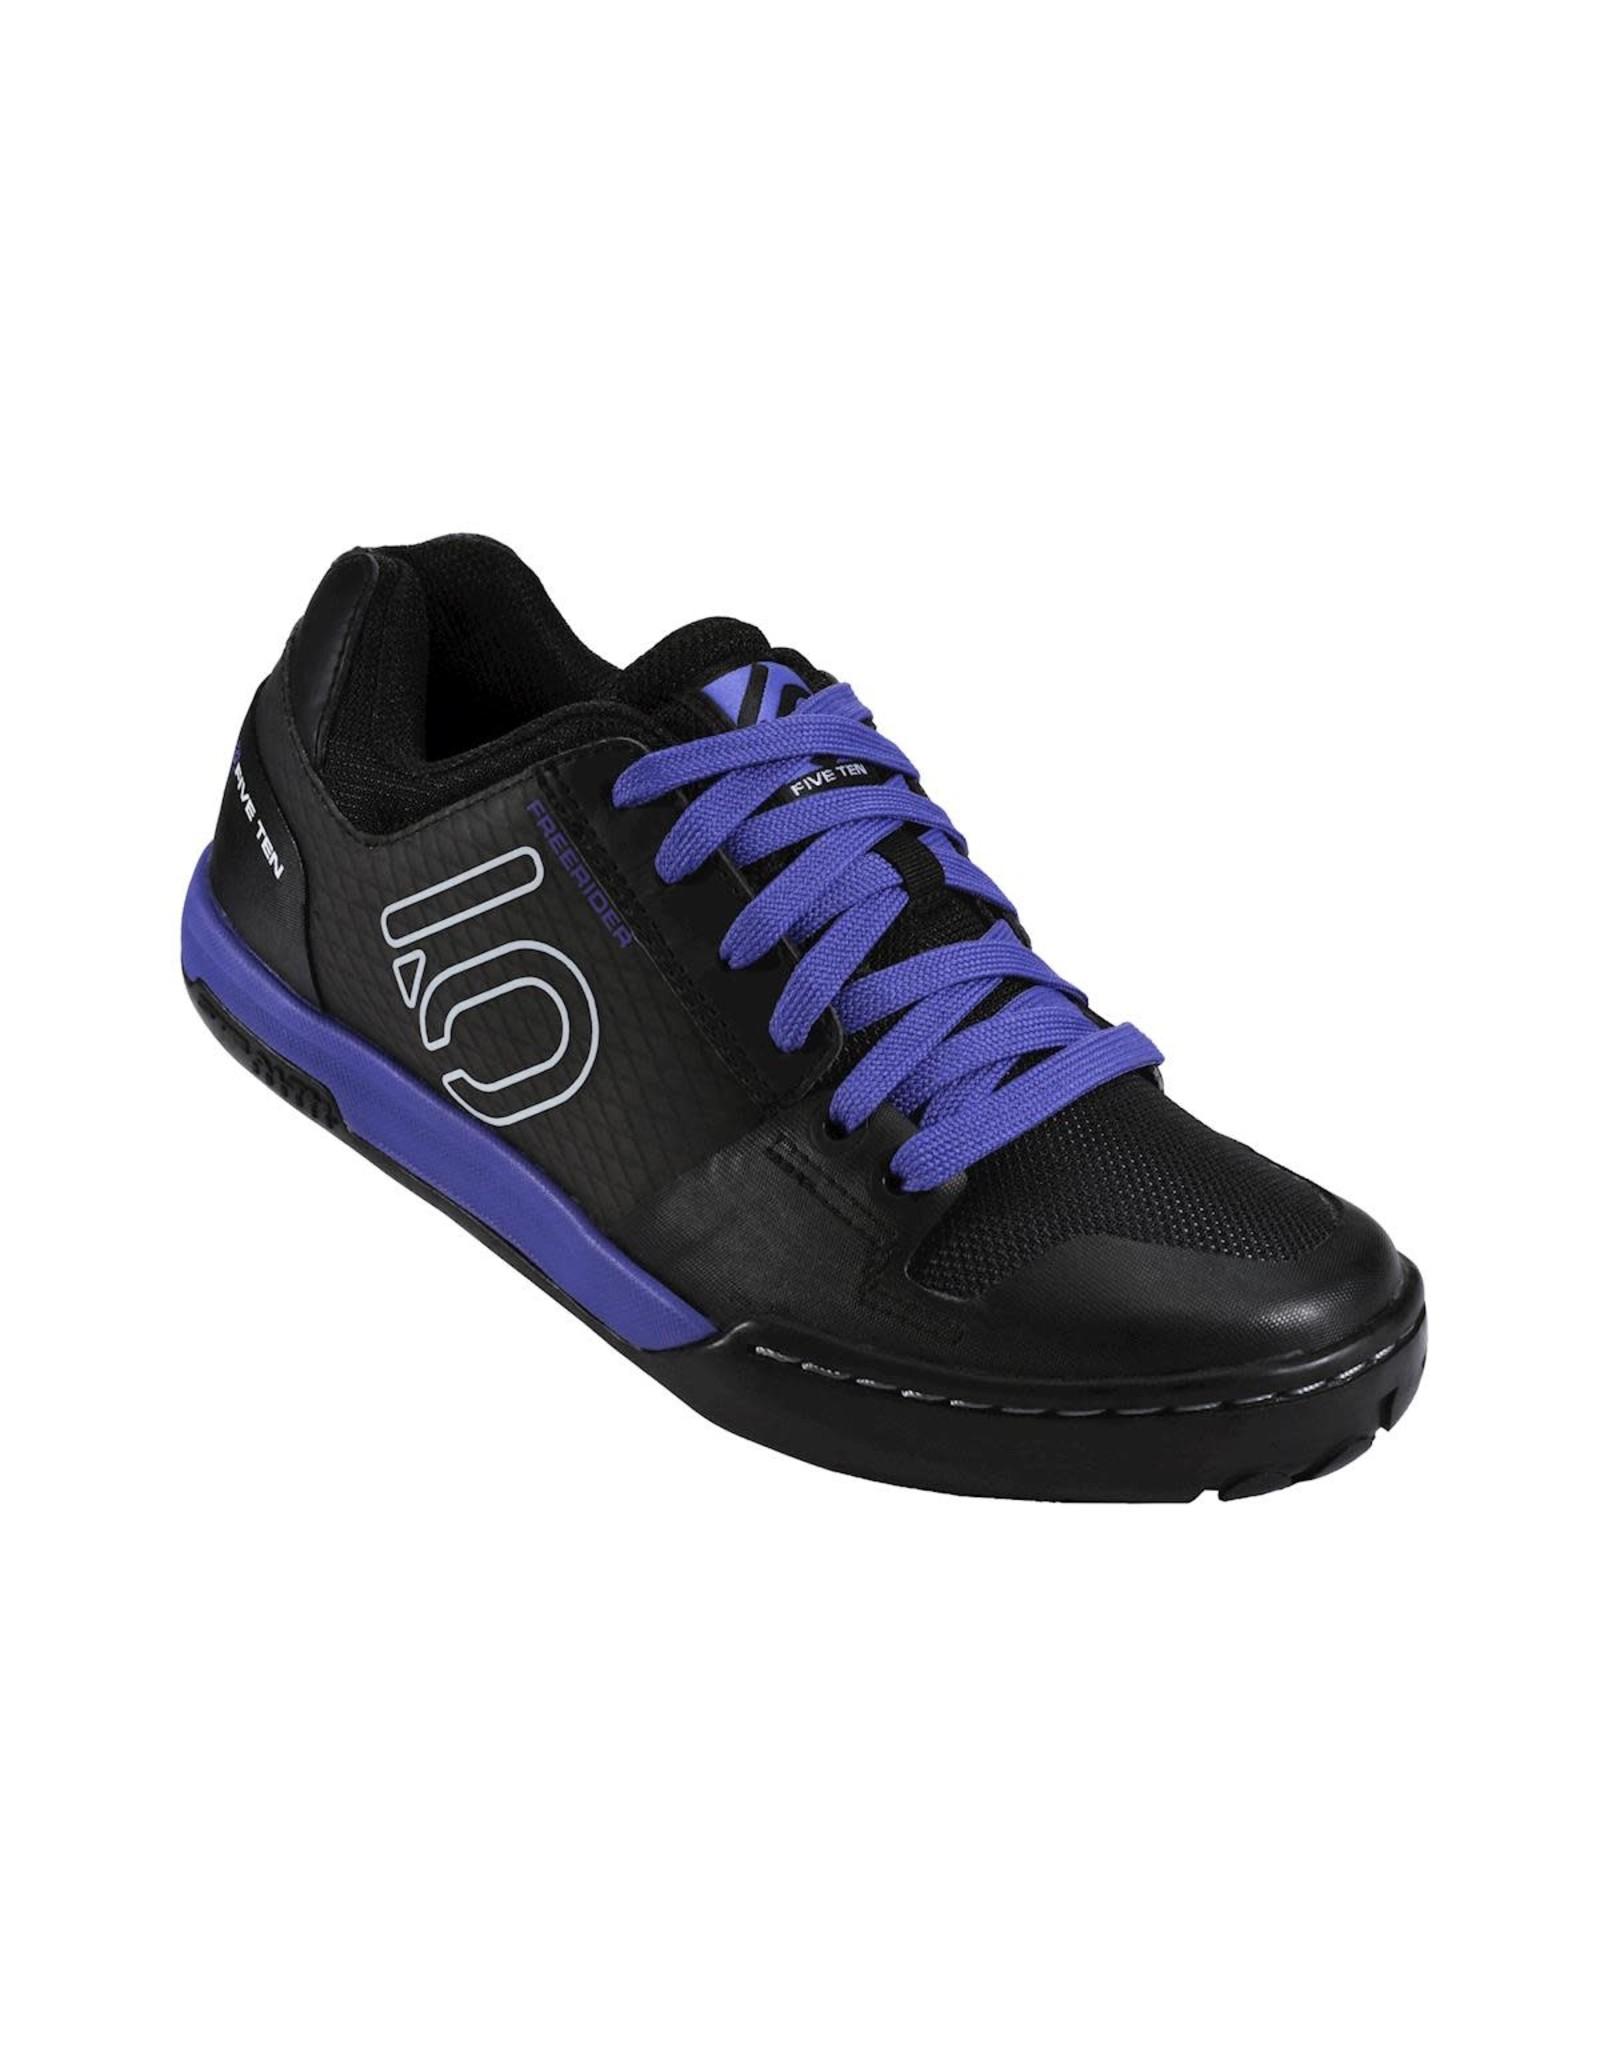 Five Ten Five Ten Freerider Contact Women's Flat Pedal Shoe: Split Purple 9